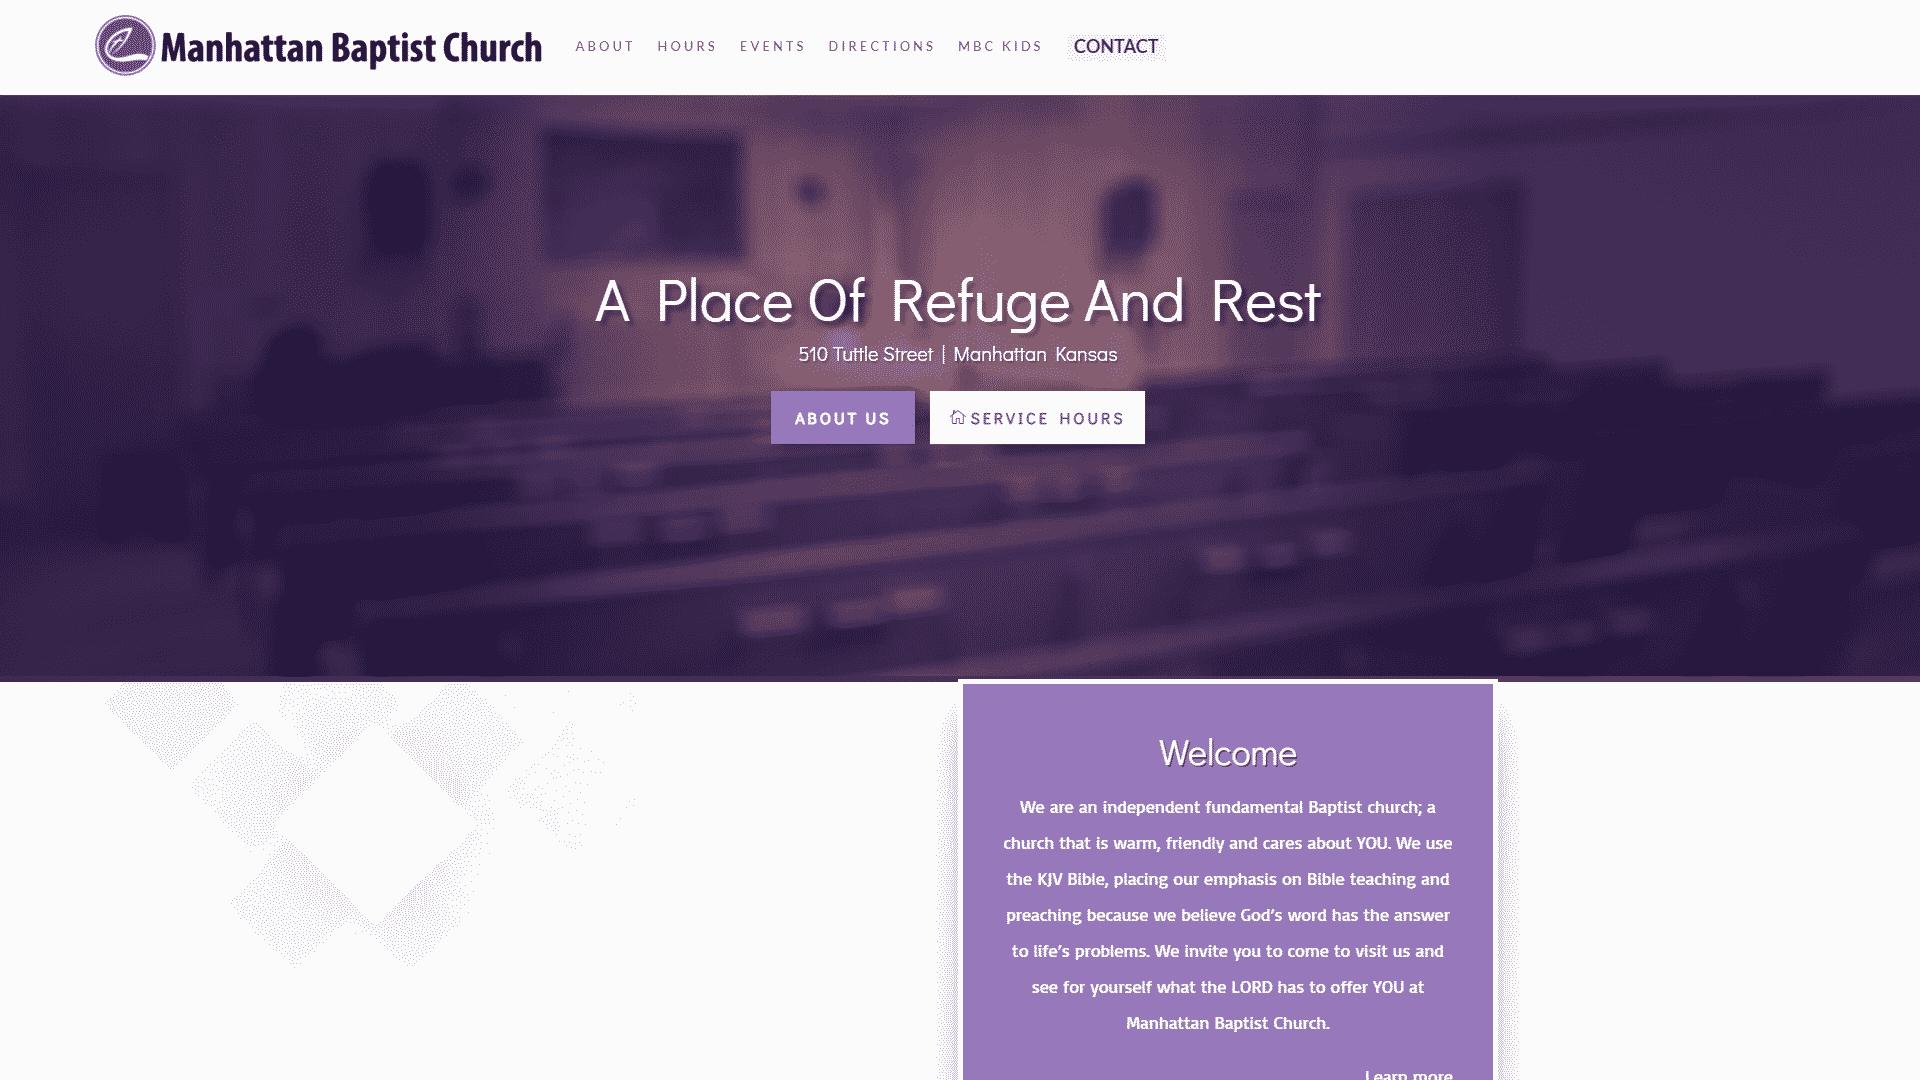 MKS Web Design created the website for Manhattan Baptist Church